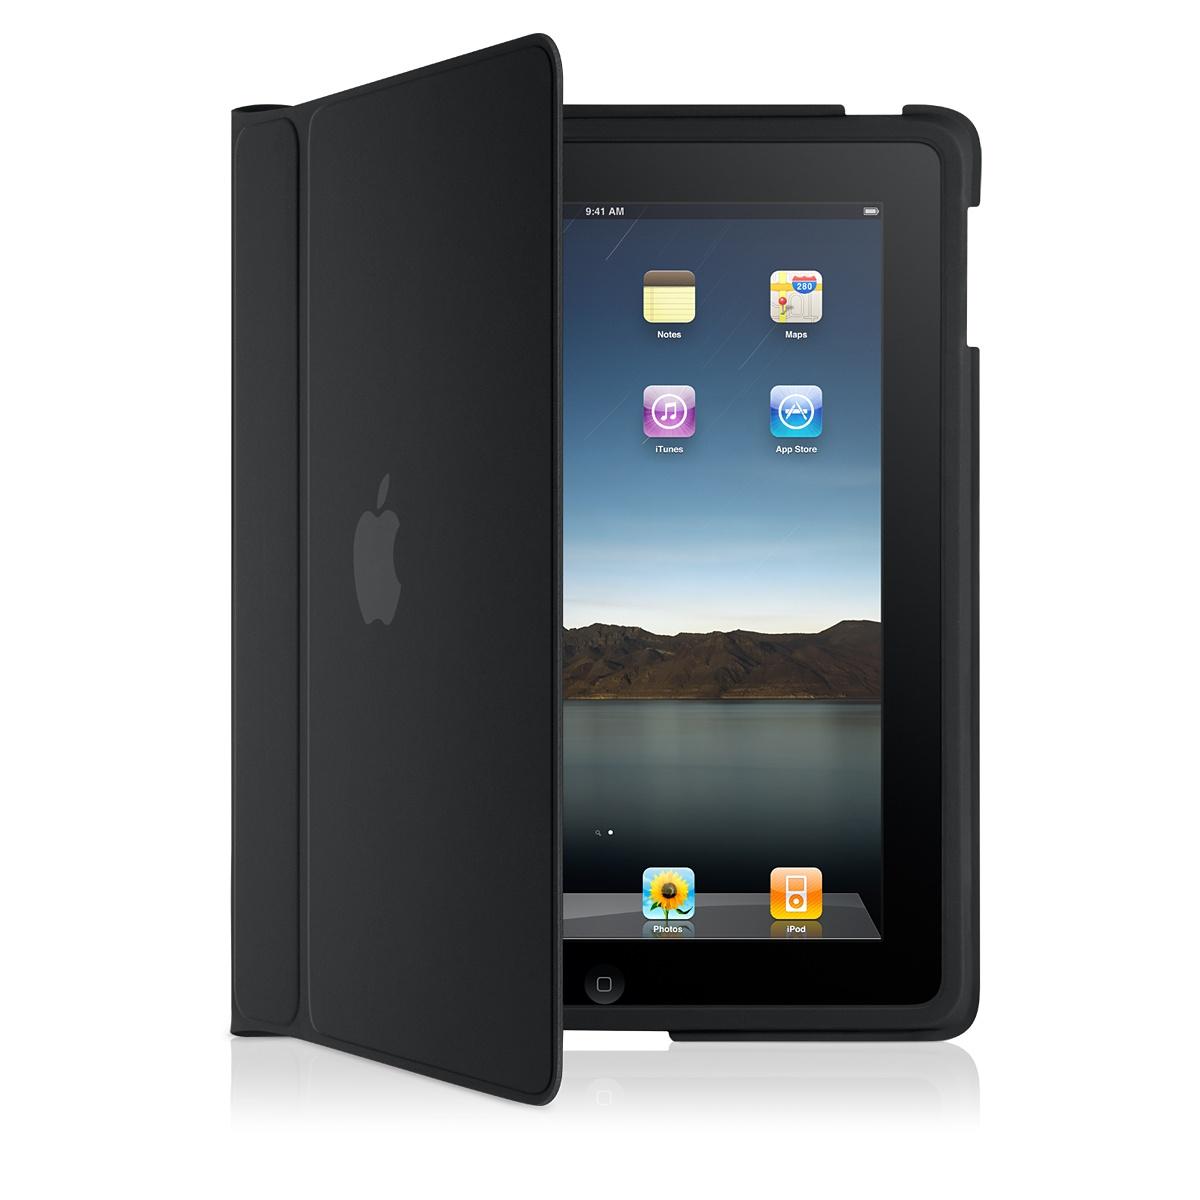 apple ipad accessories ipad case tech world. Black Bedroom Furniture Sets. Home Design Ideas